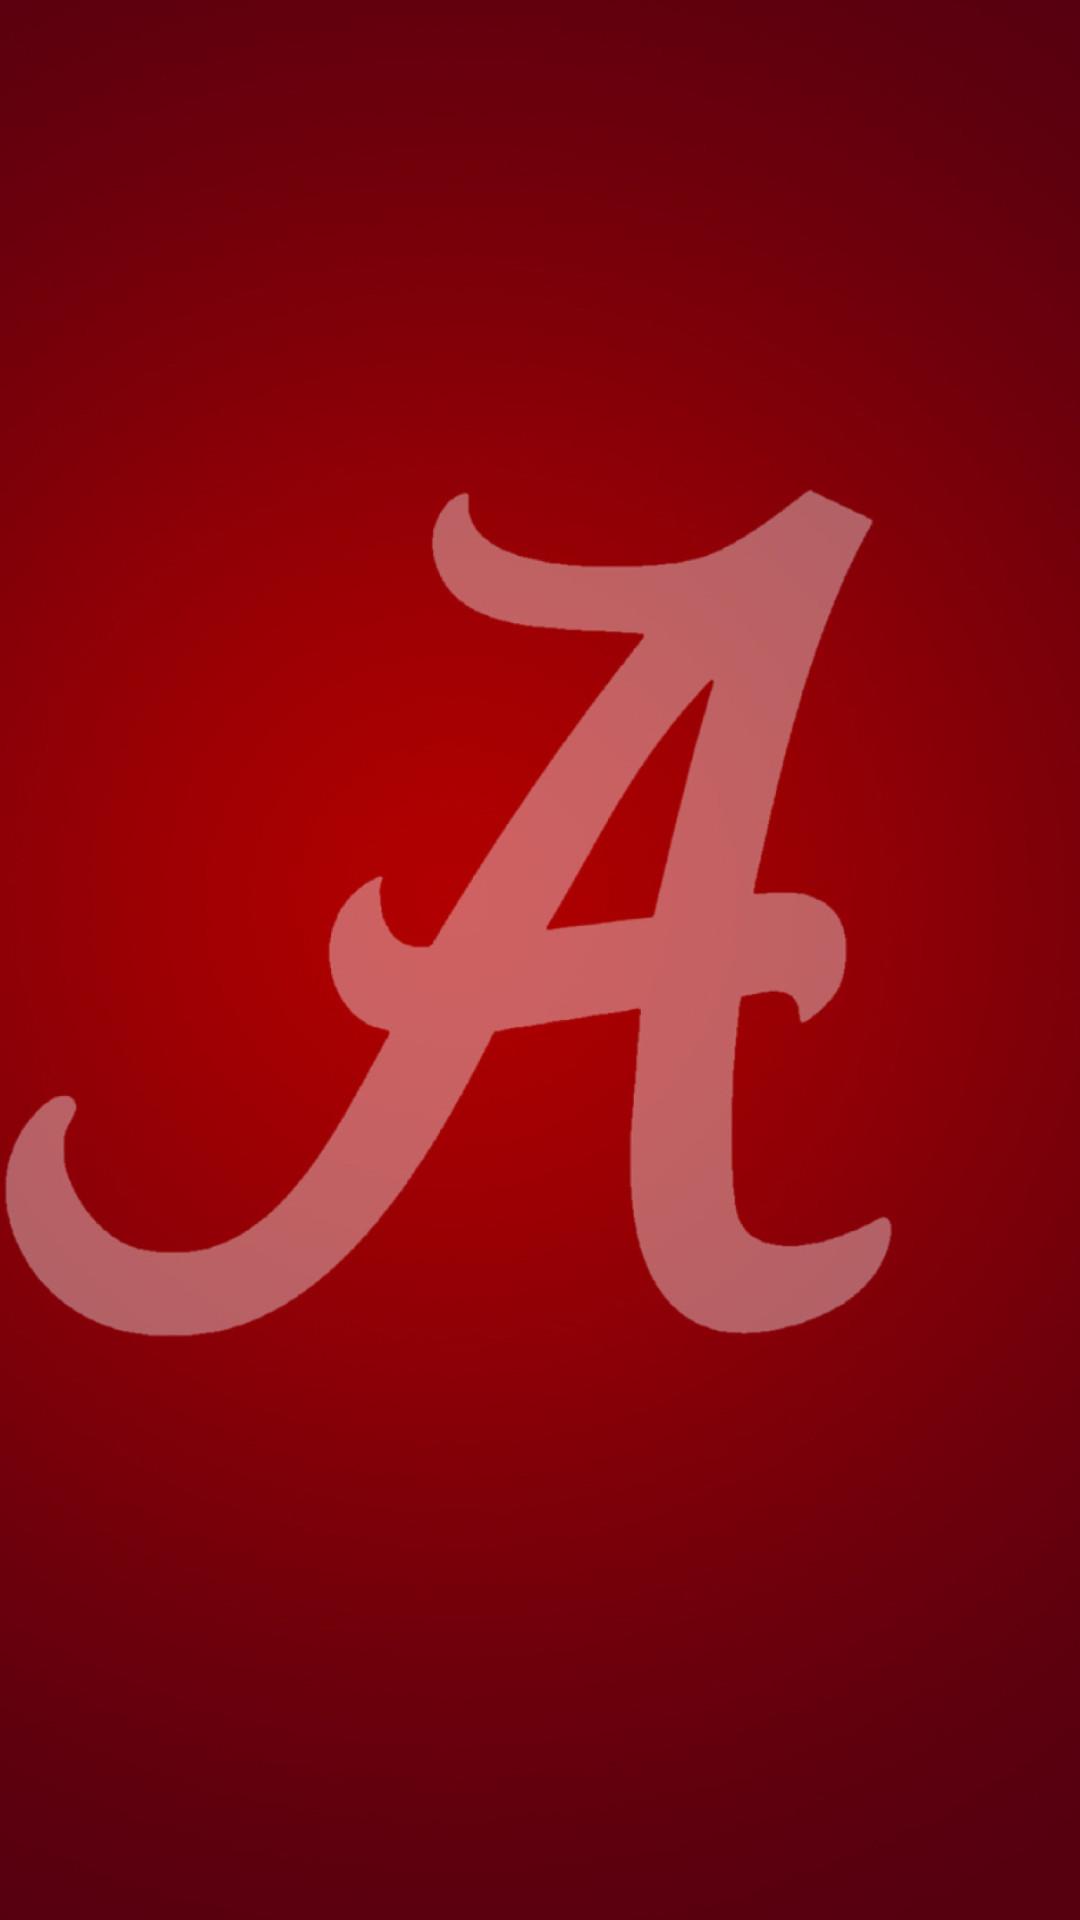 Alabama-Football-Wallpaper-HD-for-Android.jpg (1080×